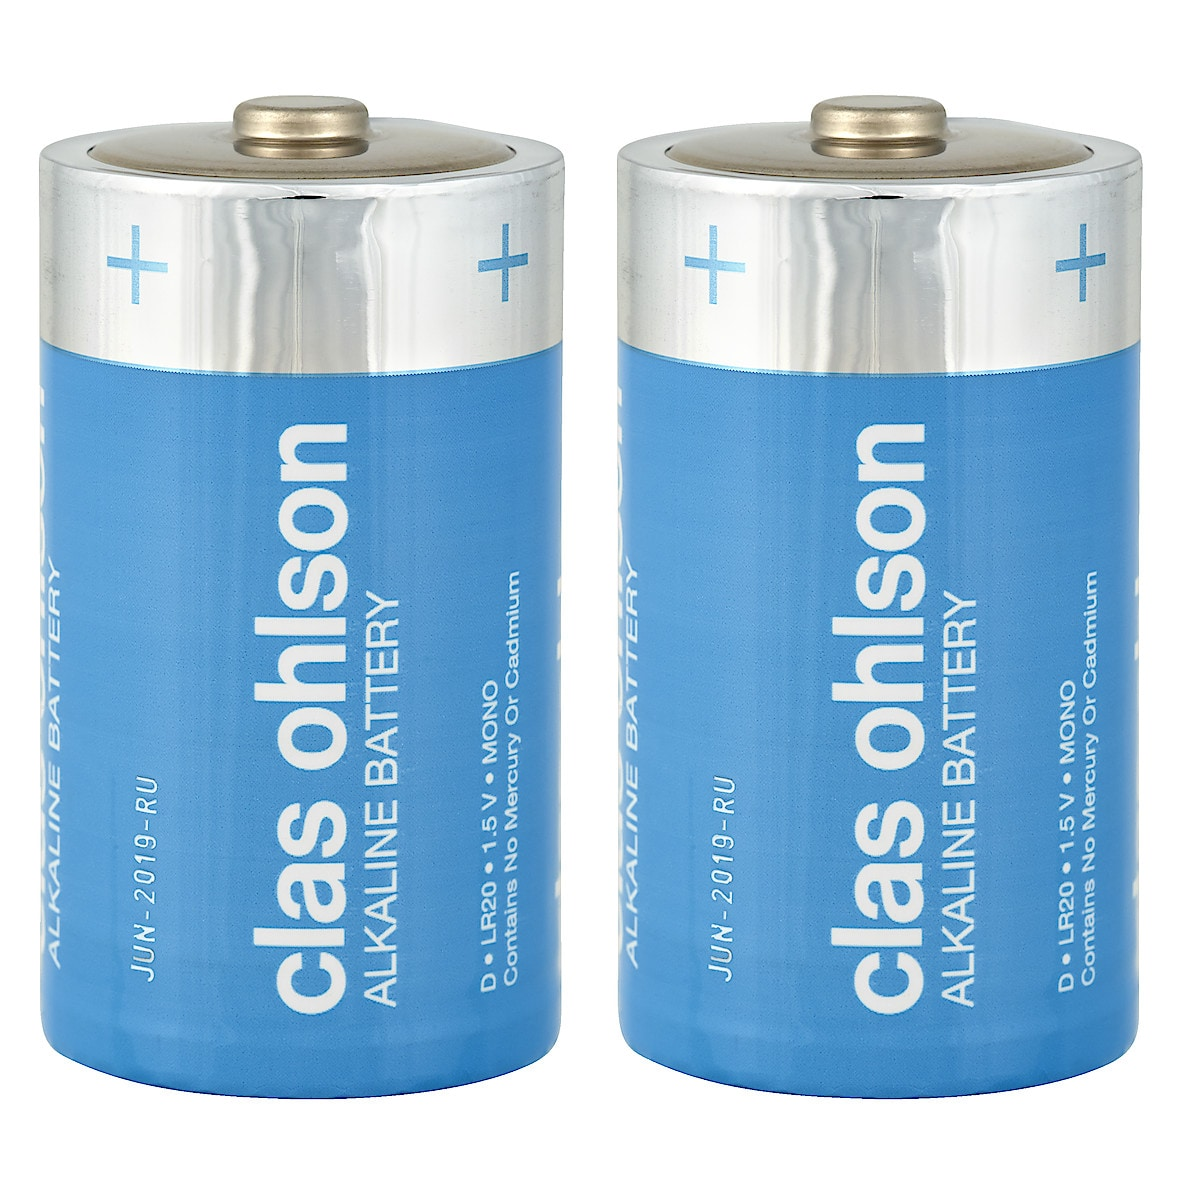 Clas Ohlson D/LR20 alkalisk batteri